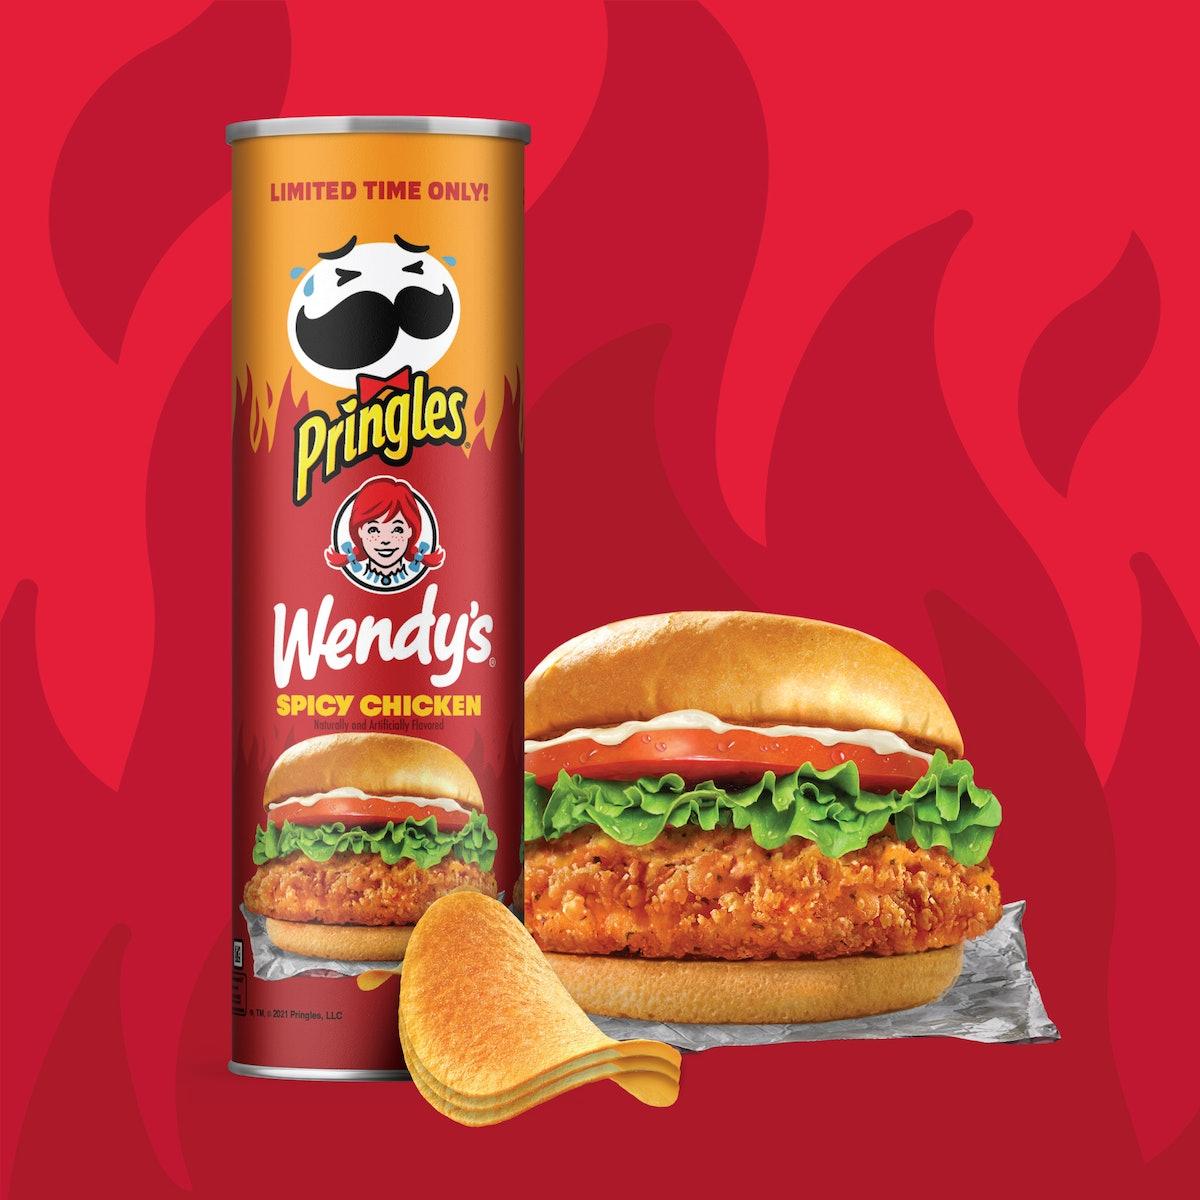 Pringles' new Wendy's Spicy Chicken Sandwich flavor is so fire.